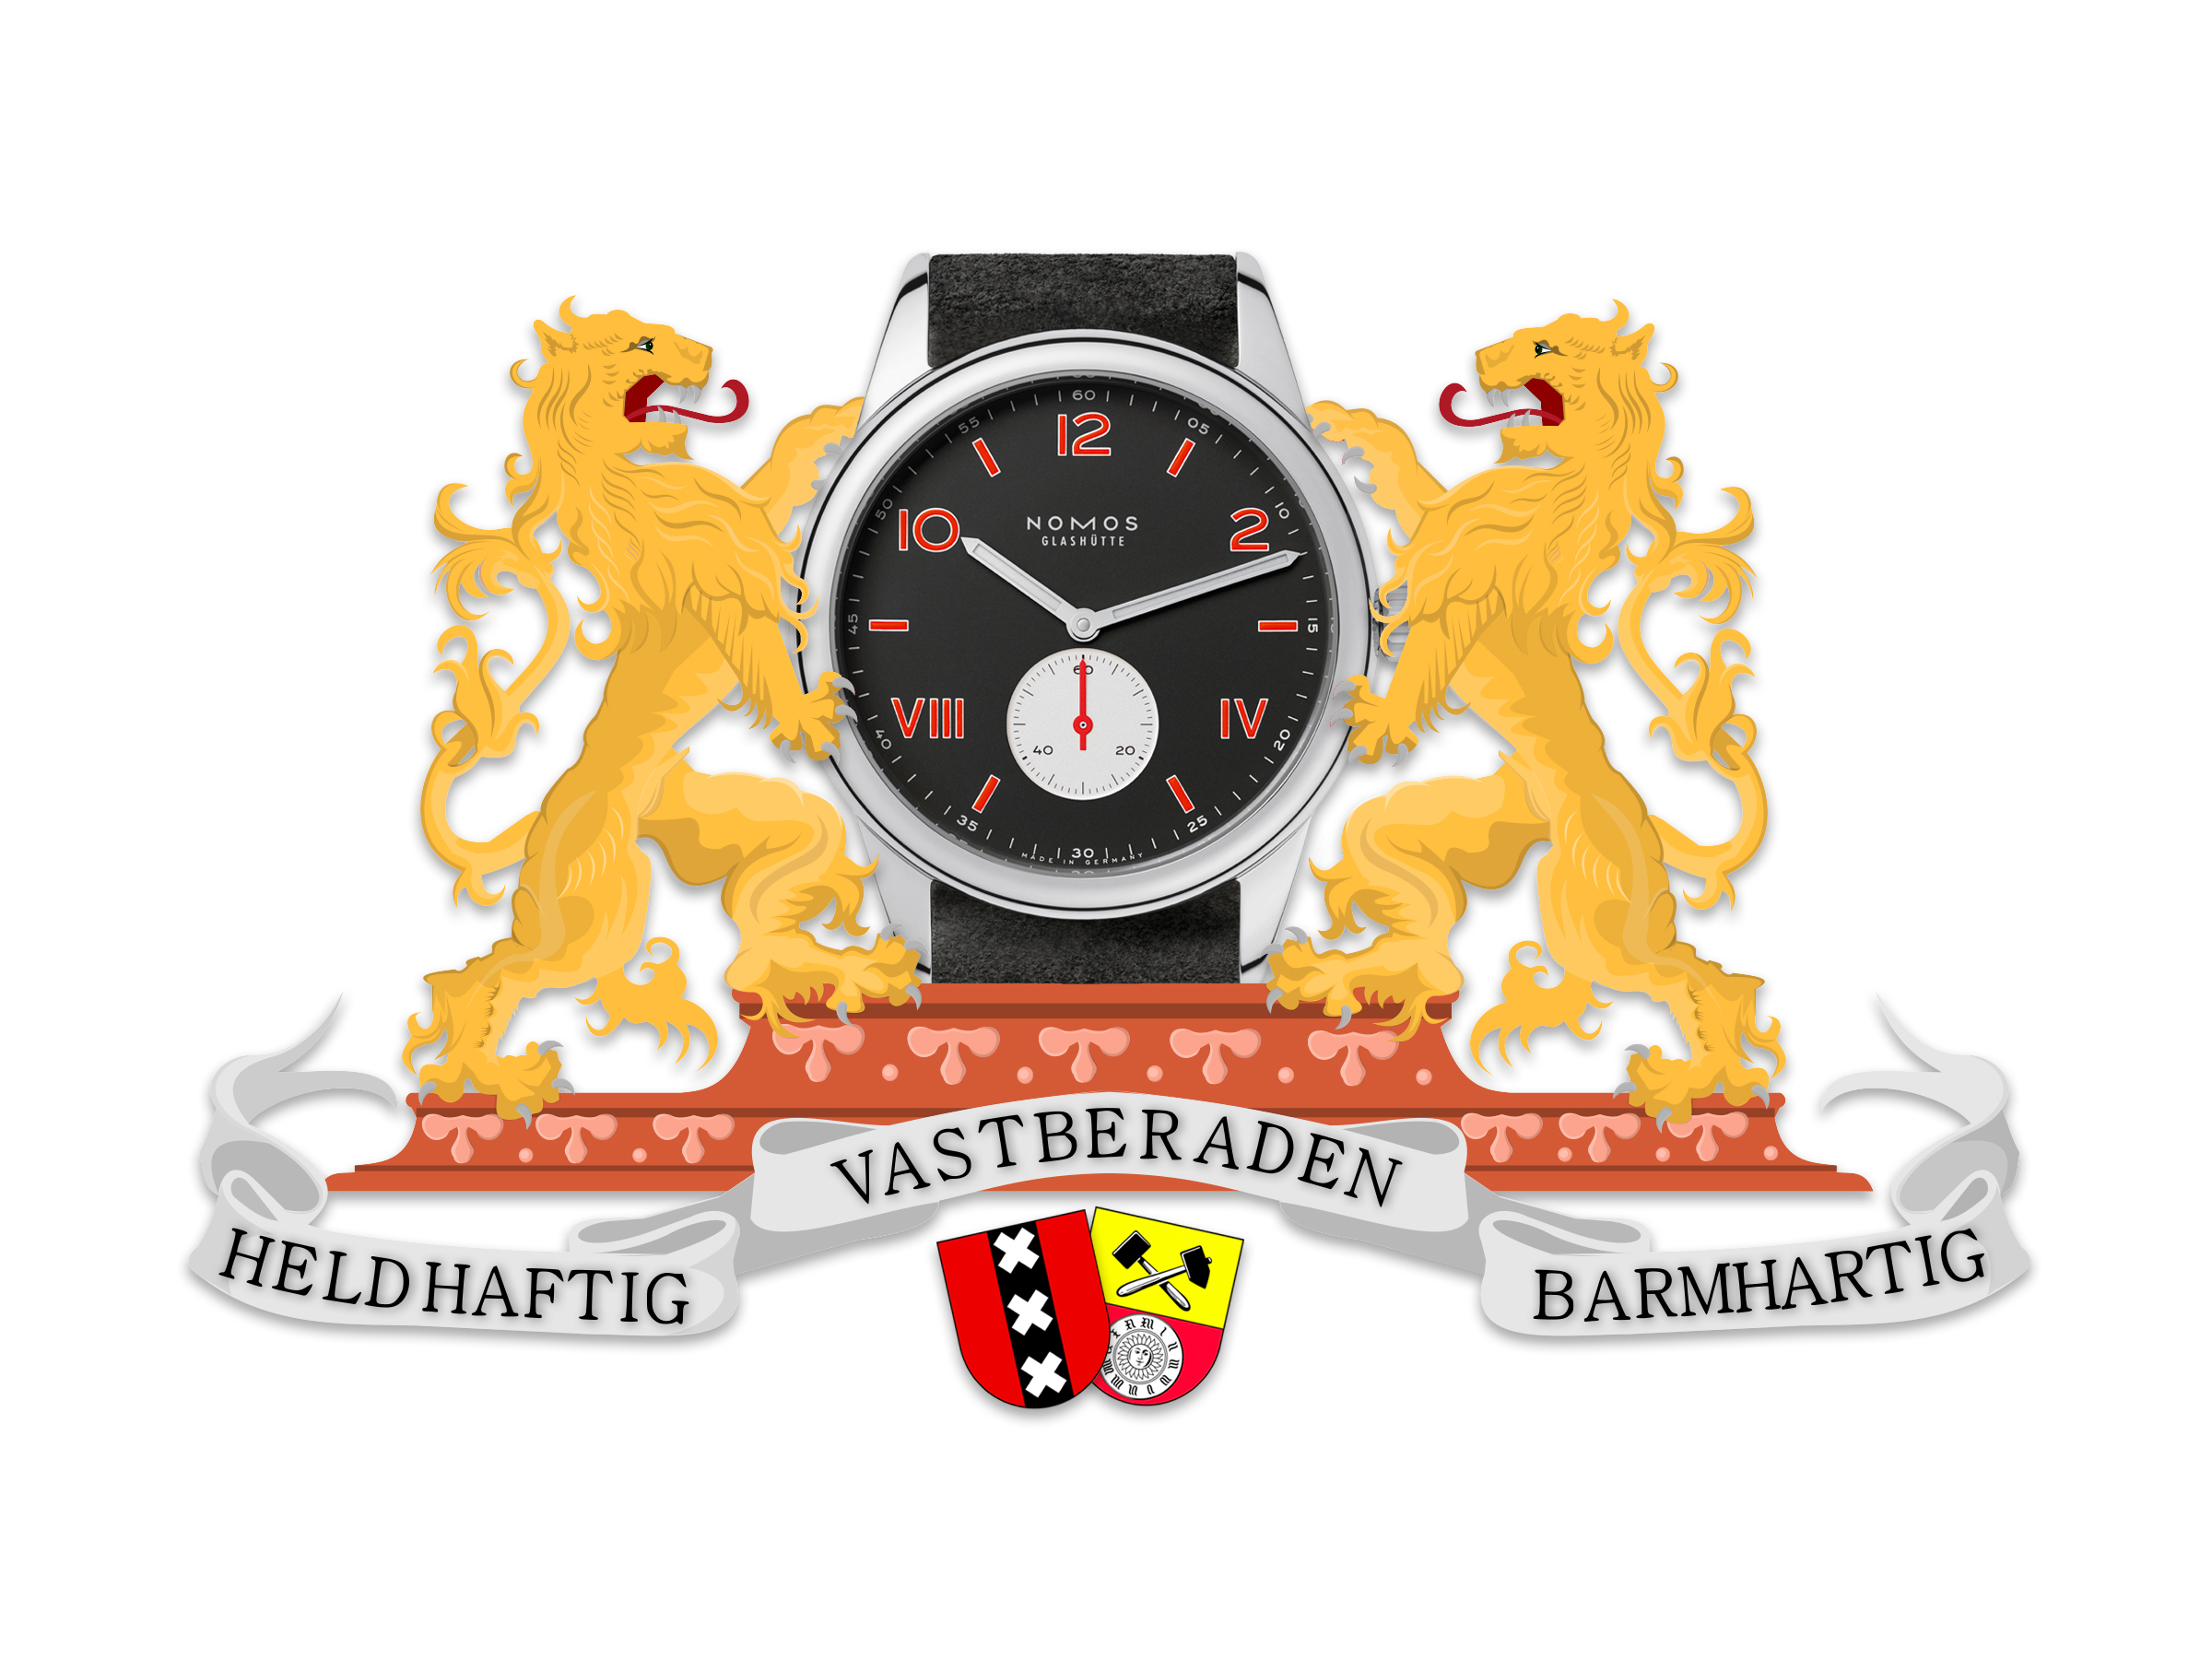 van de Ace x Nomos Glashütte Club Campus Amsterdam is bepaald geen achenebbisj horloge, wel heel Amsterdams